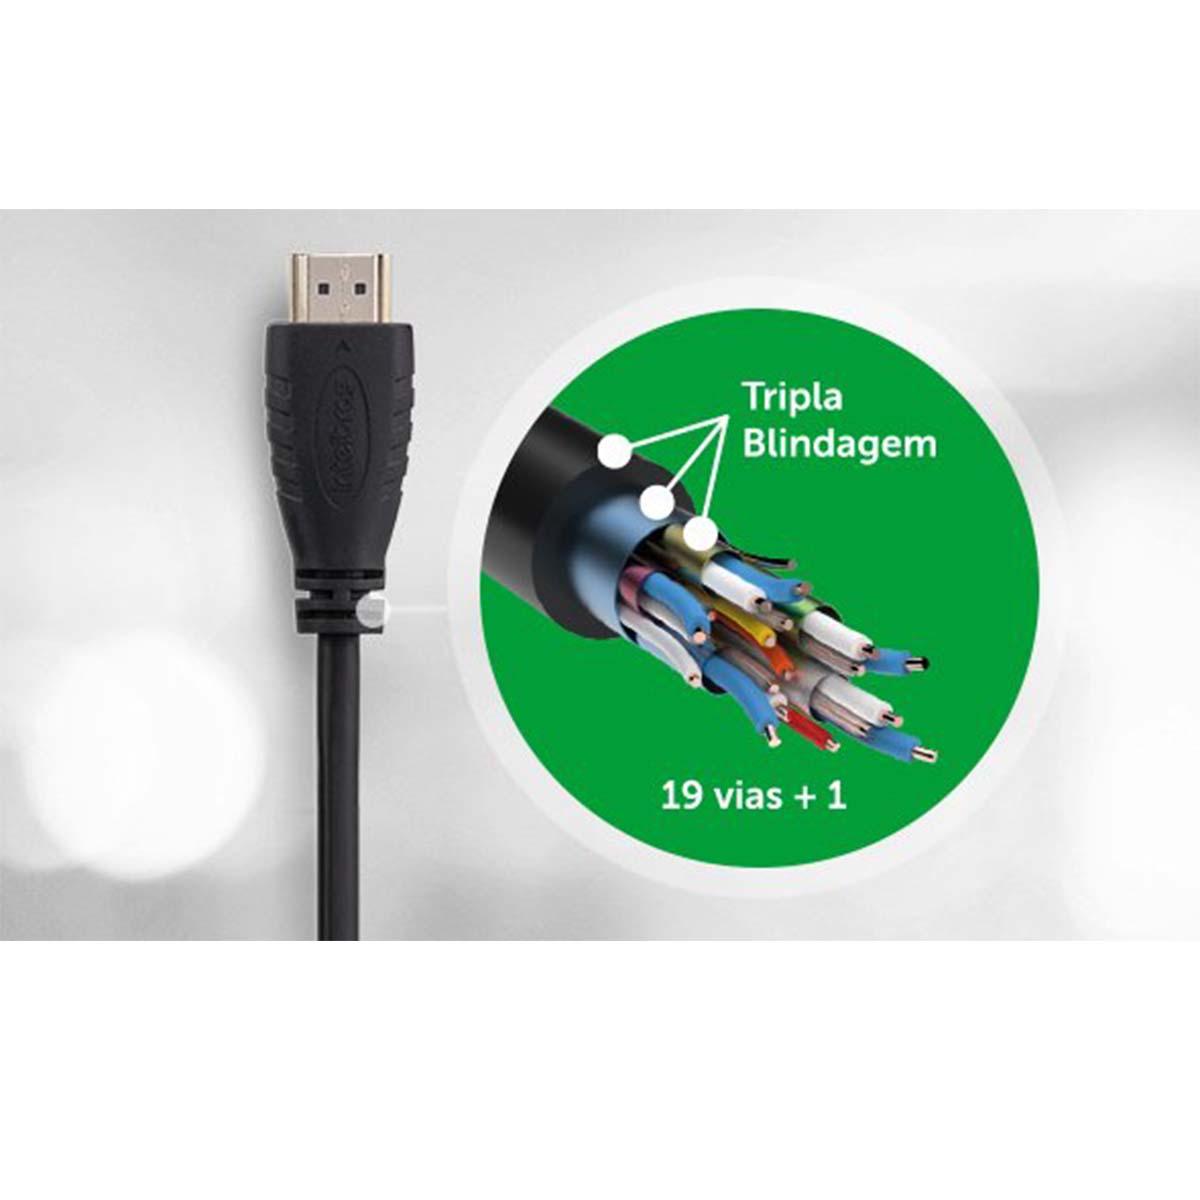 CABO HDMI INTELBRAS 2.0 1,5M CH 2015